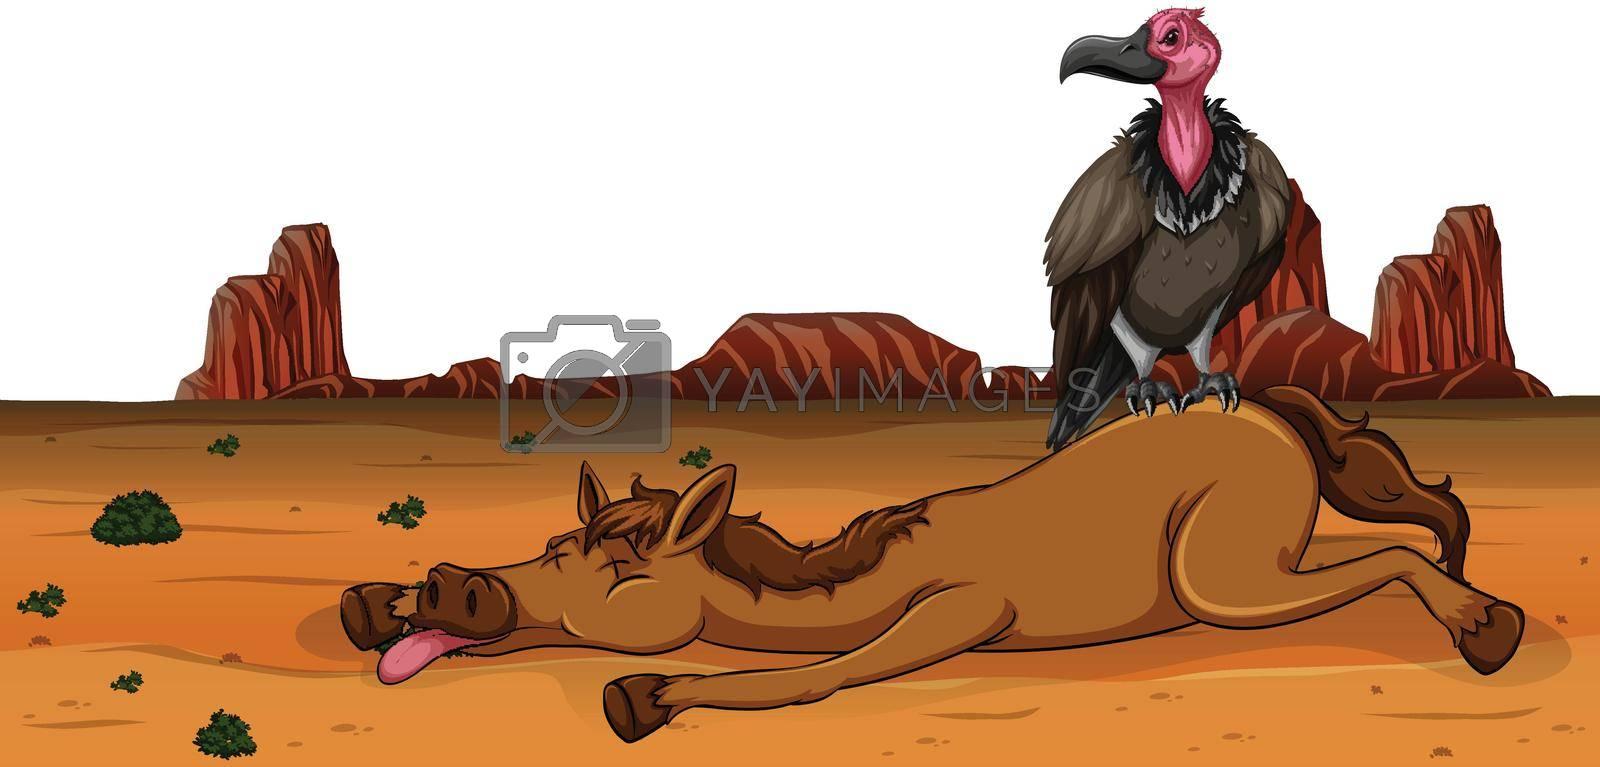 A vulture on dead horse illustration